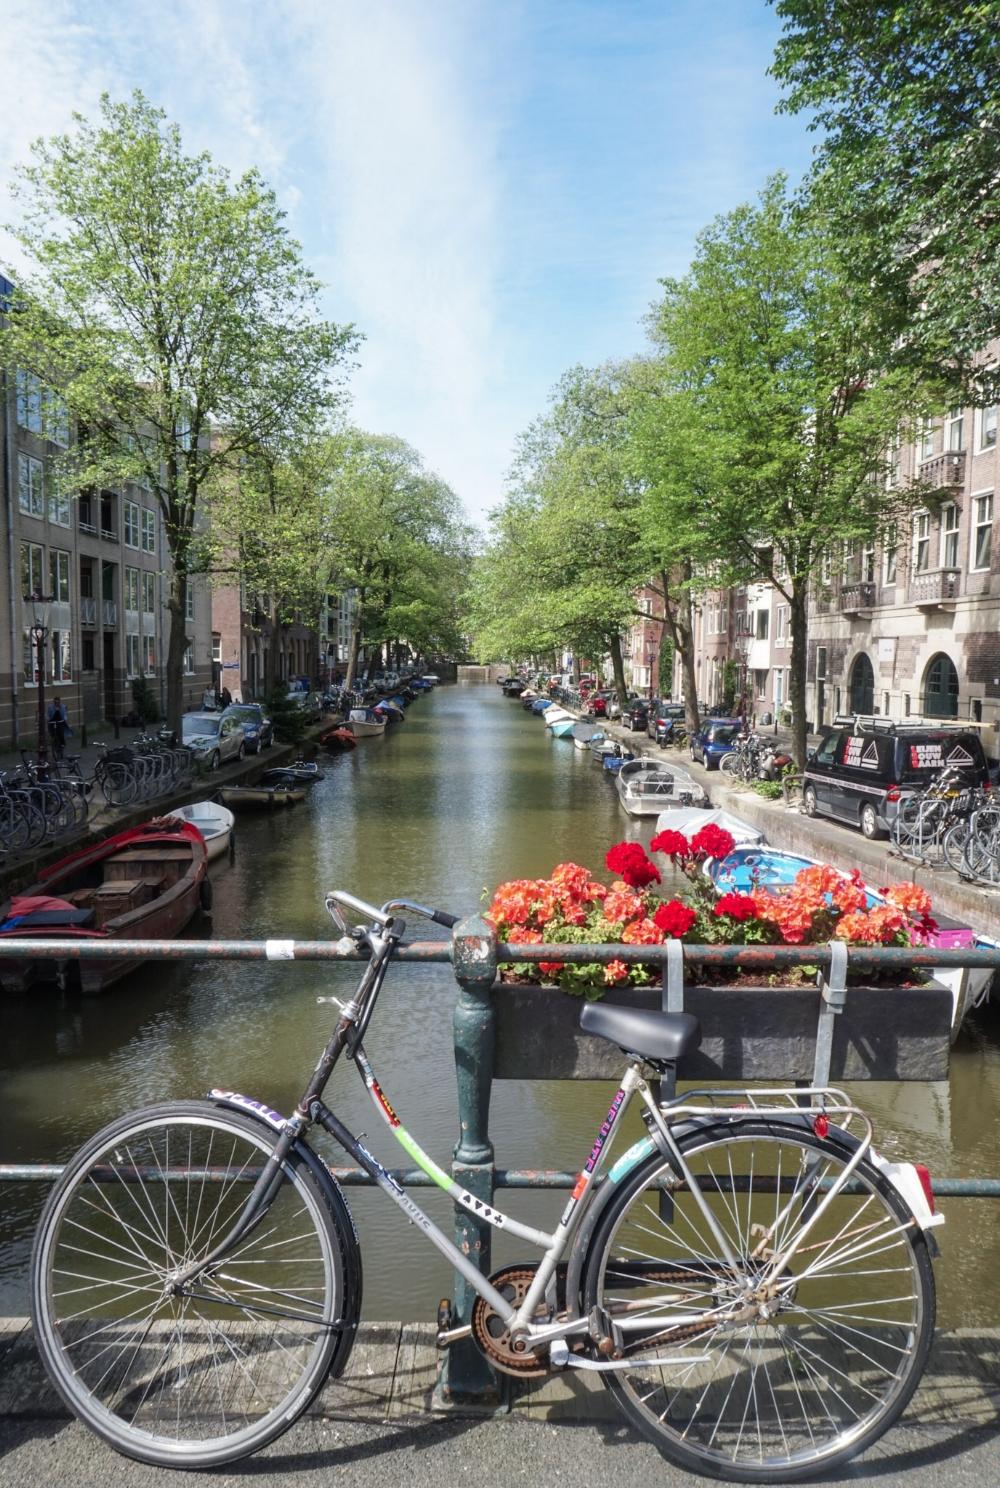 curio.trips.amsterdam.canal.bike.flowers.jpg